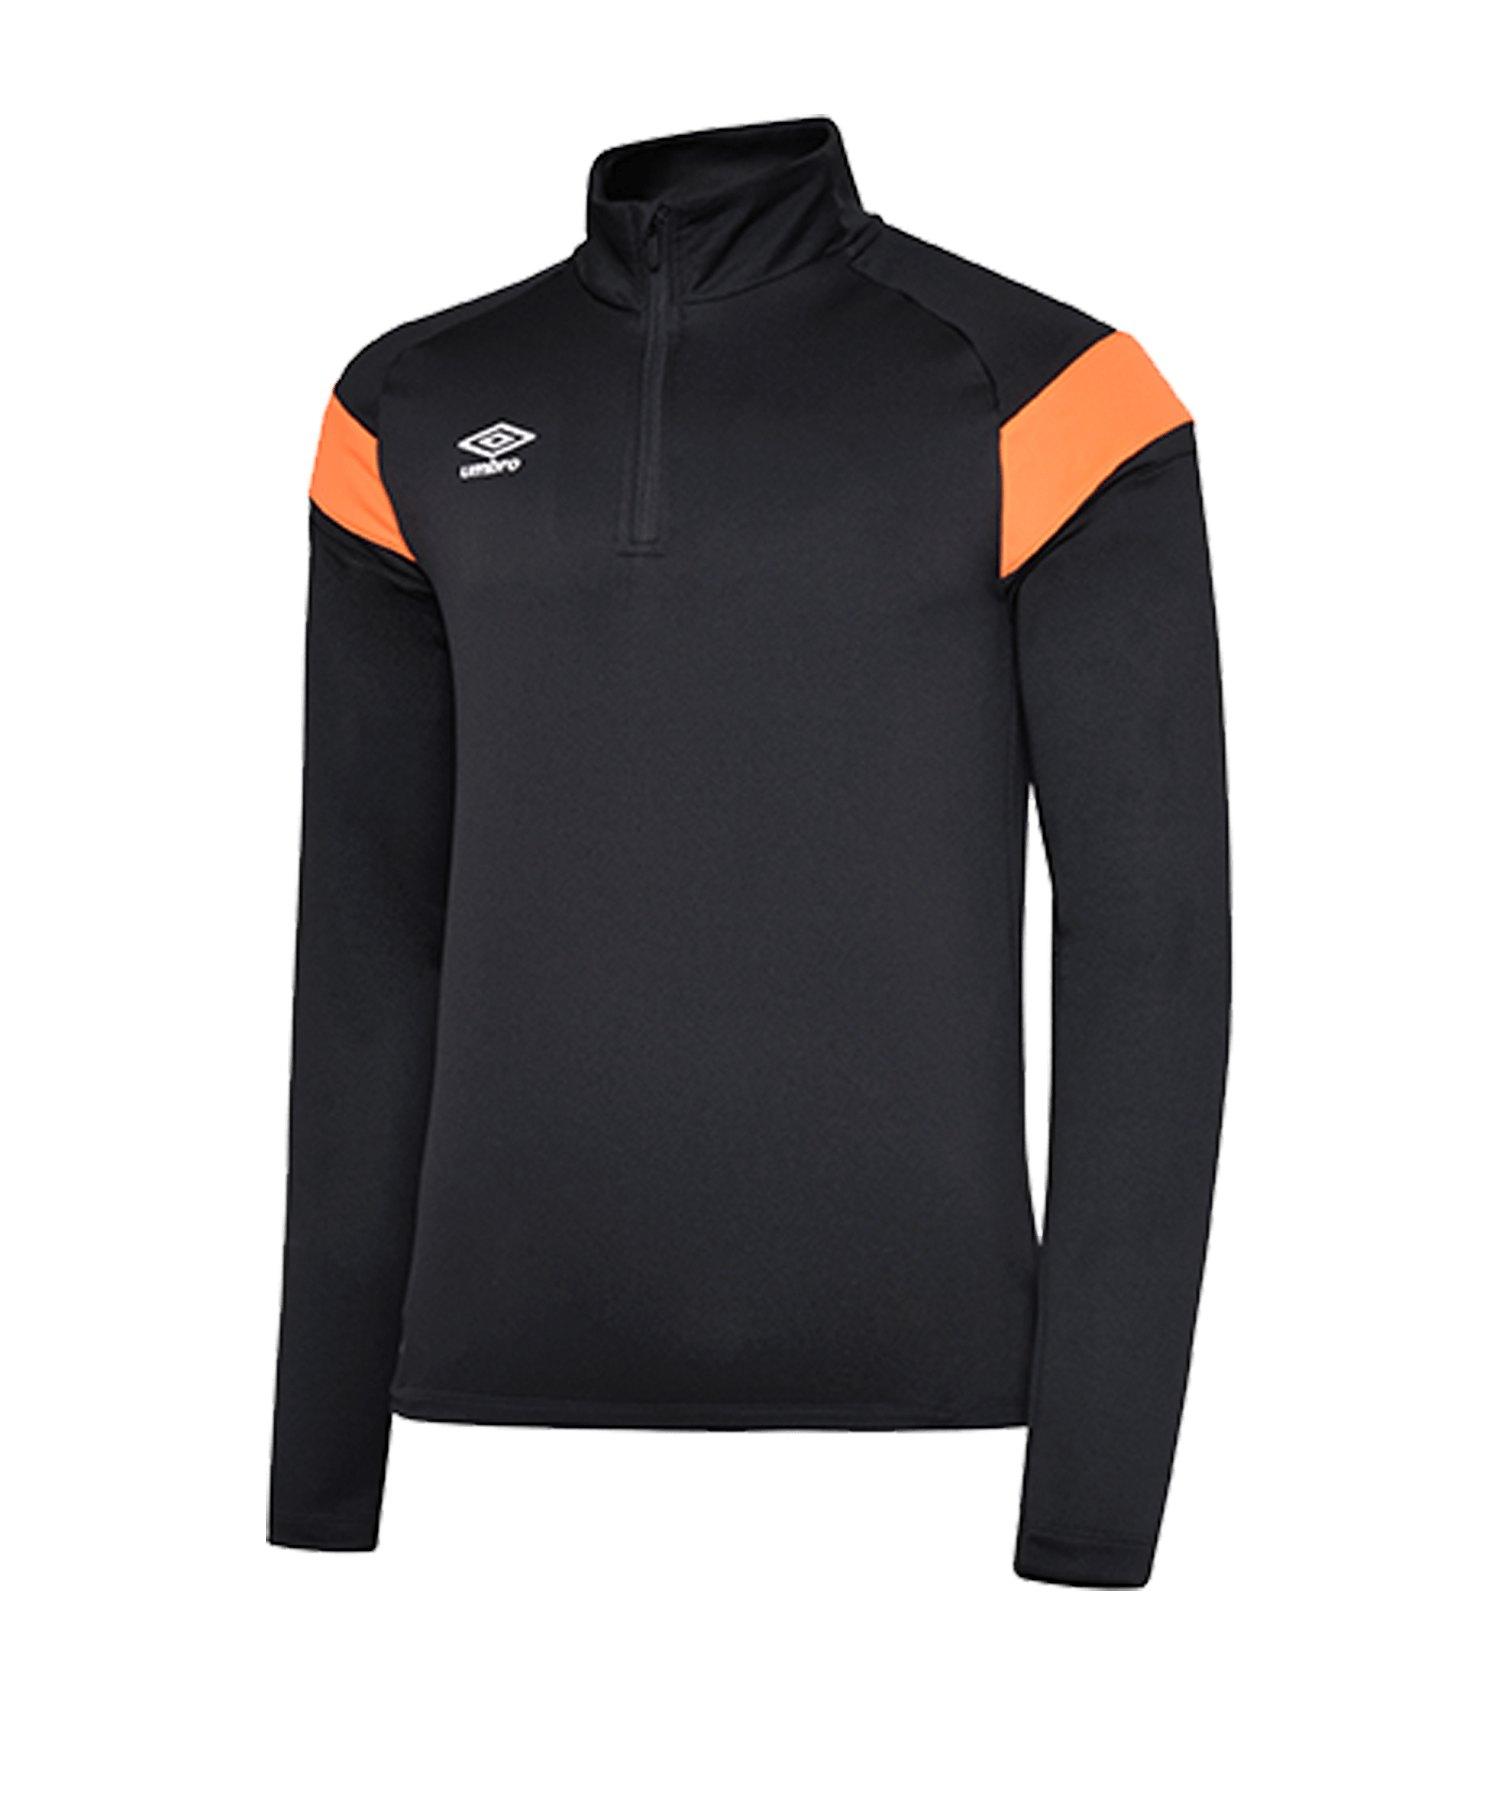 Umbro 1/2 Zip Sweatshirt Schwarz Orange F36O - schwarz